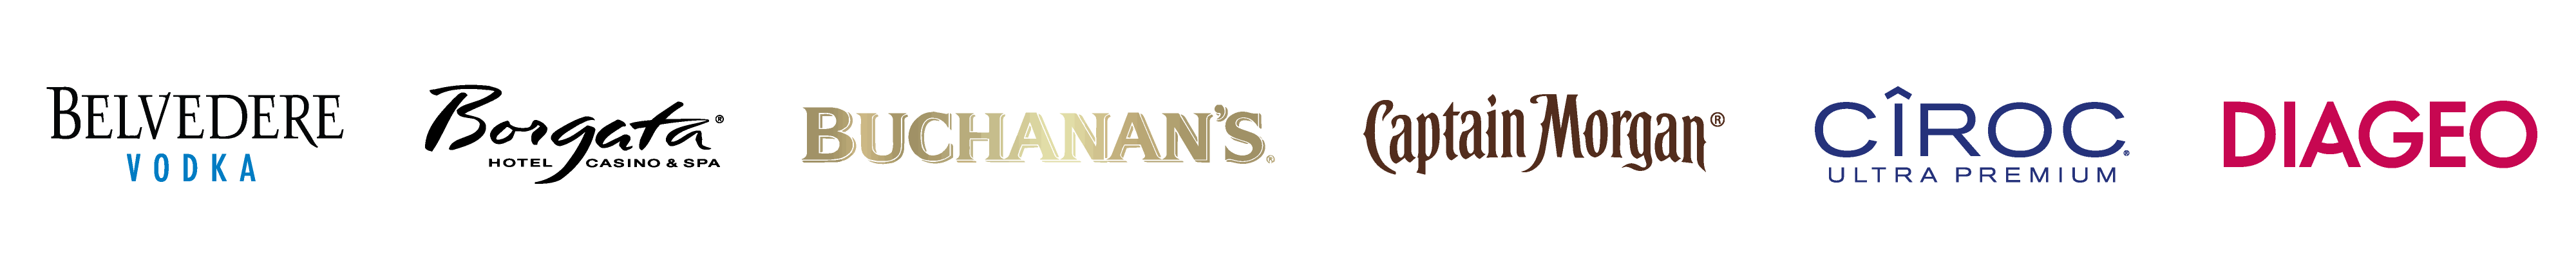 Clients_banner1-01